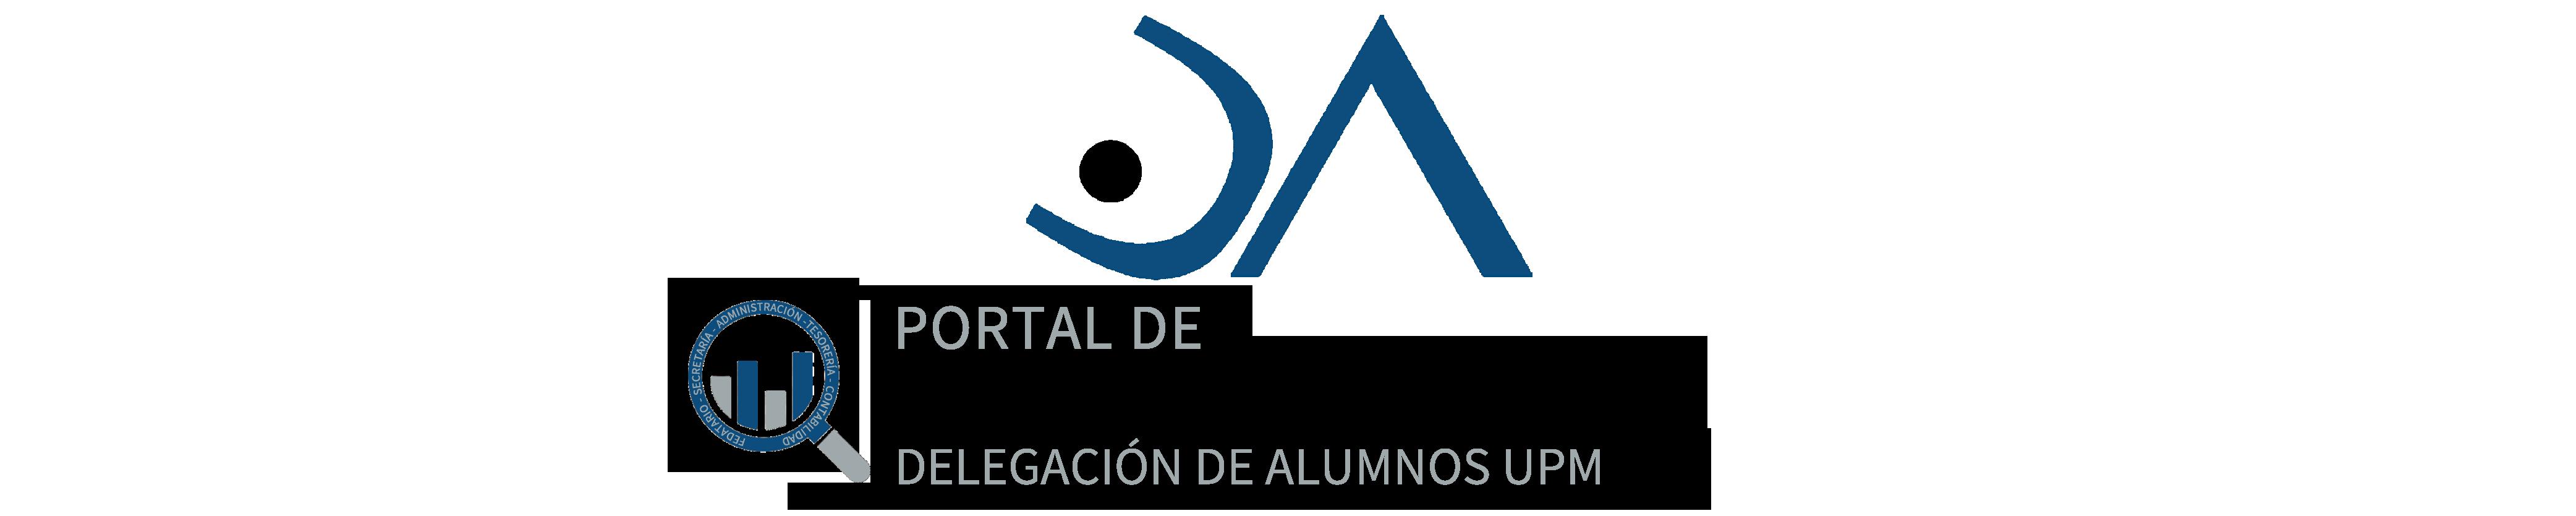 Portal de Transparencia logo